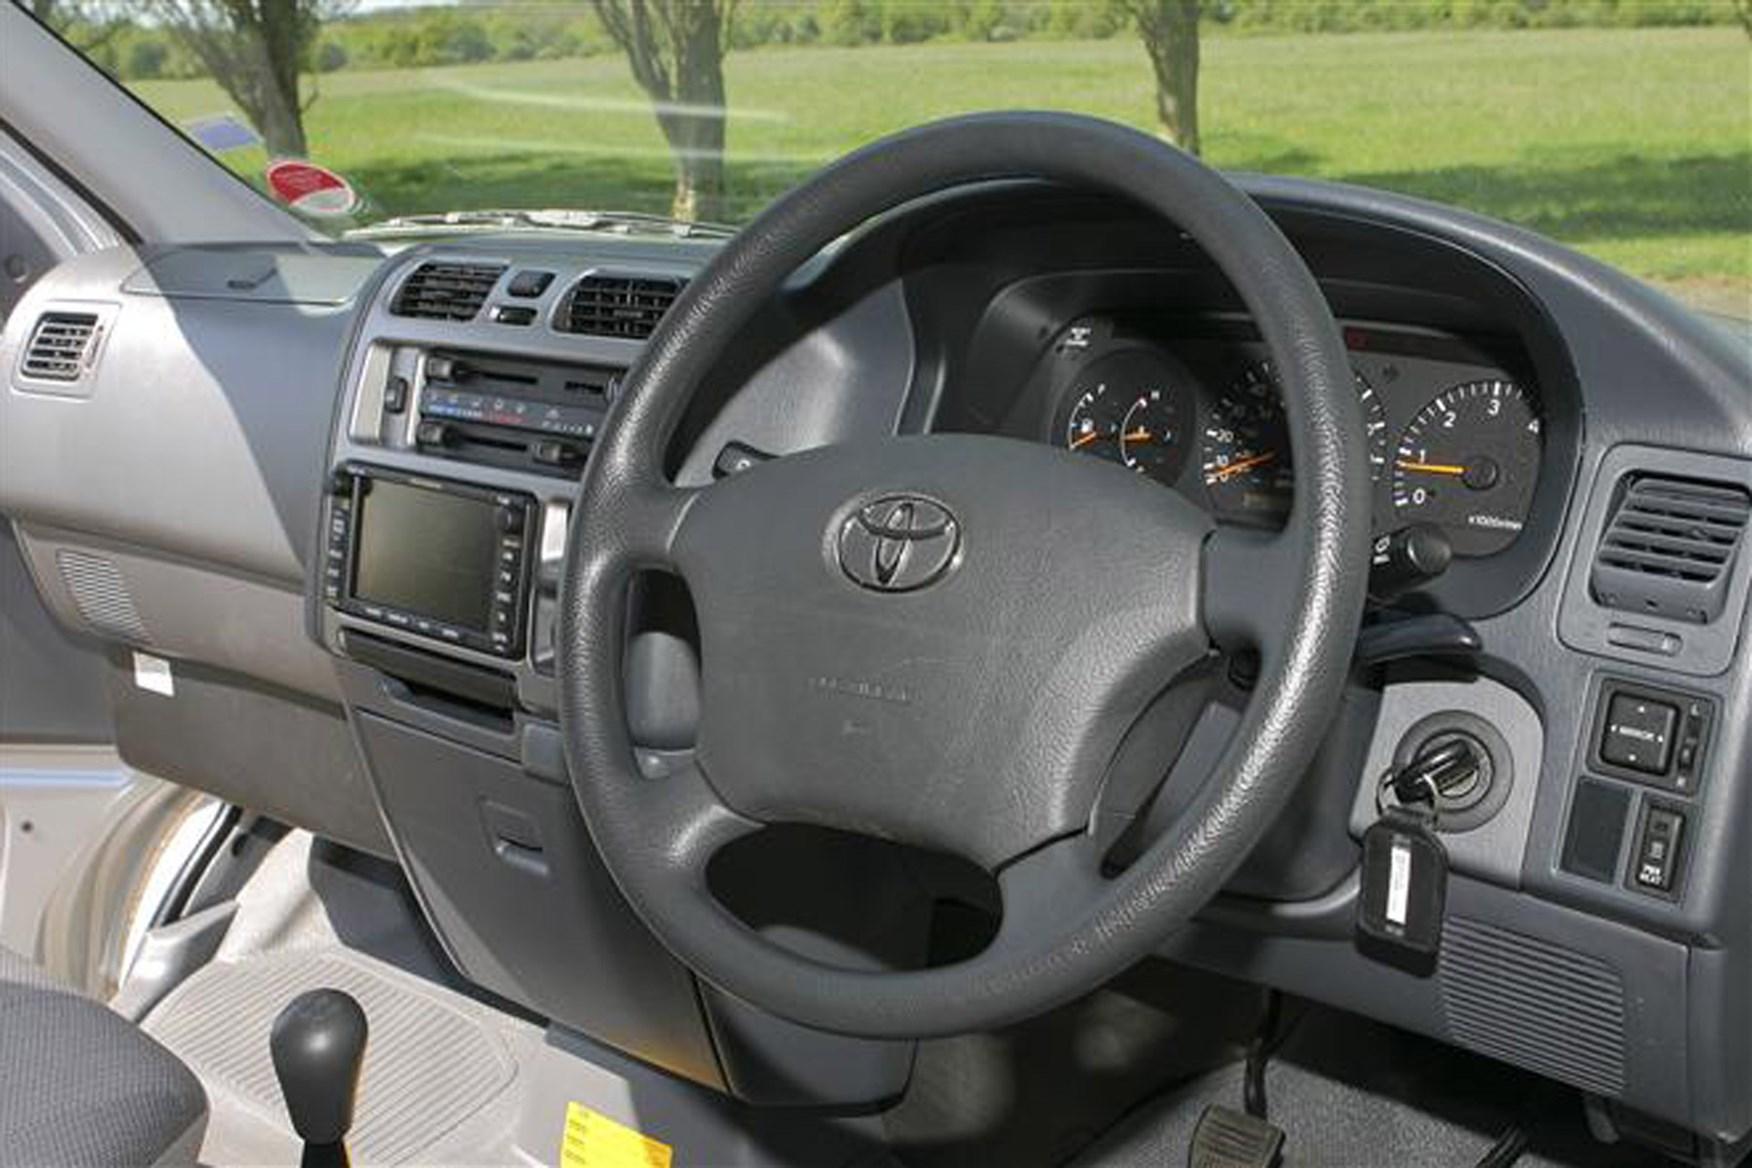 Toyota Hiace van review (1983-2012) | Parkers